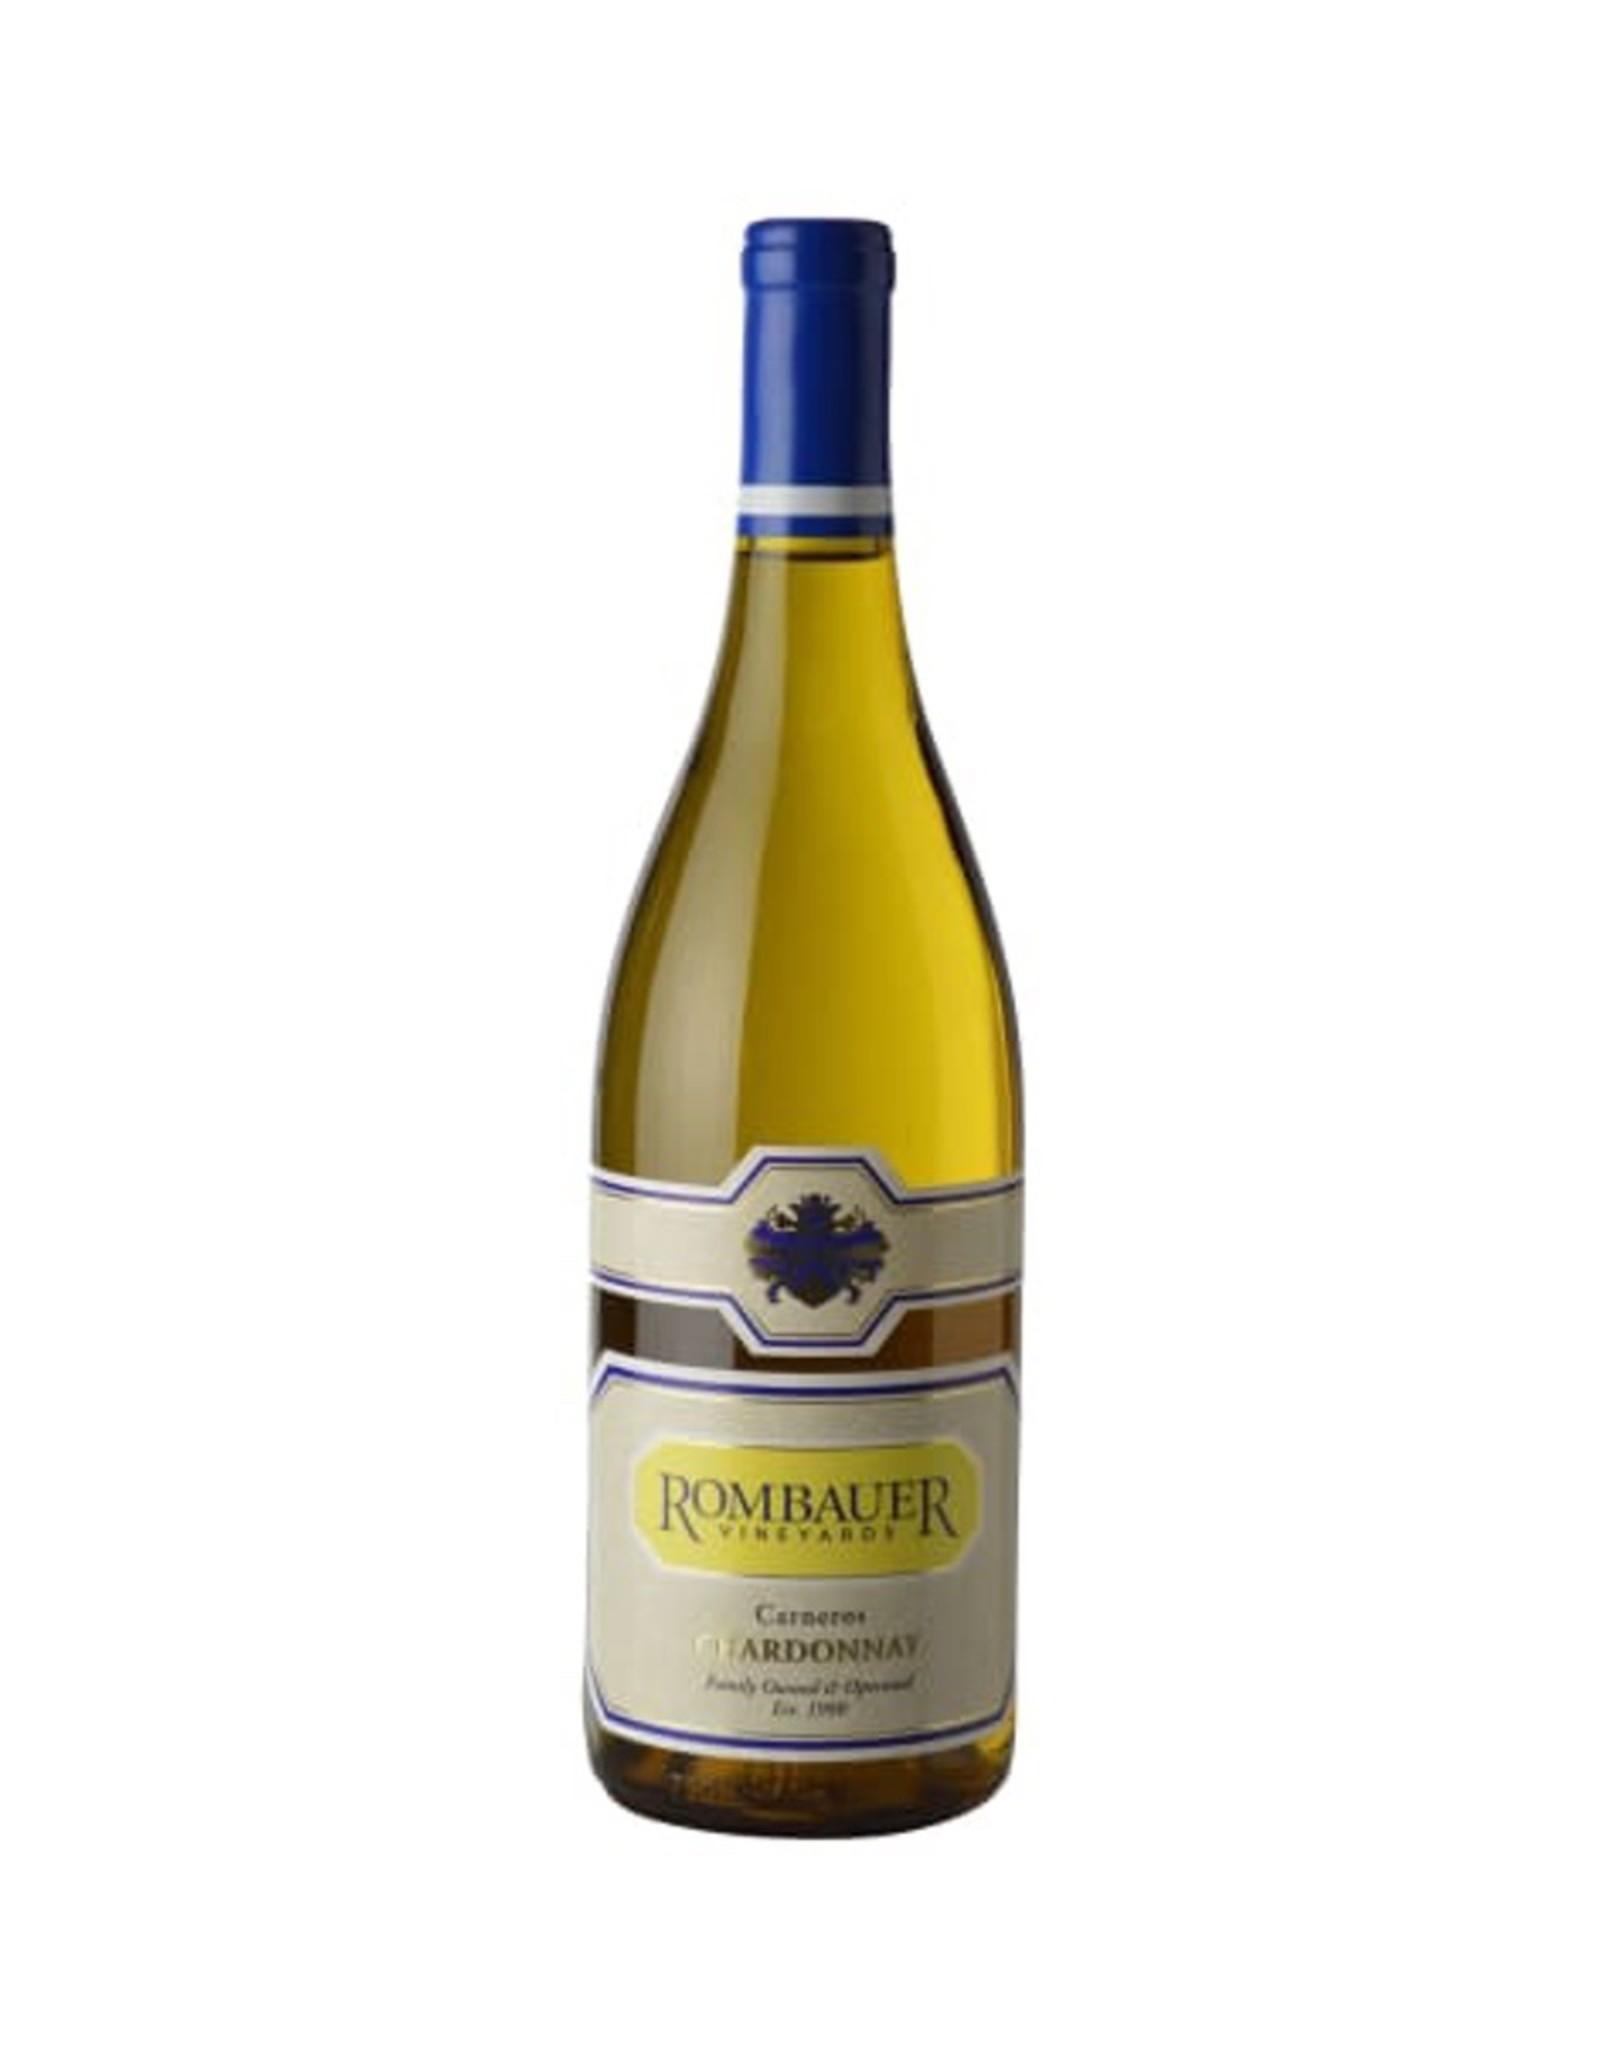 Rombauer Chardonnay Carneros 2019